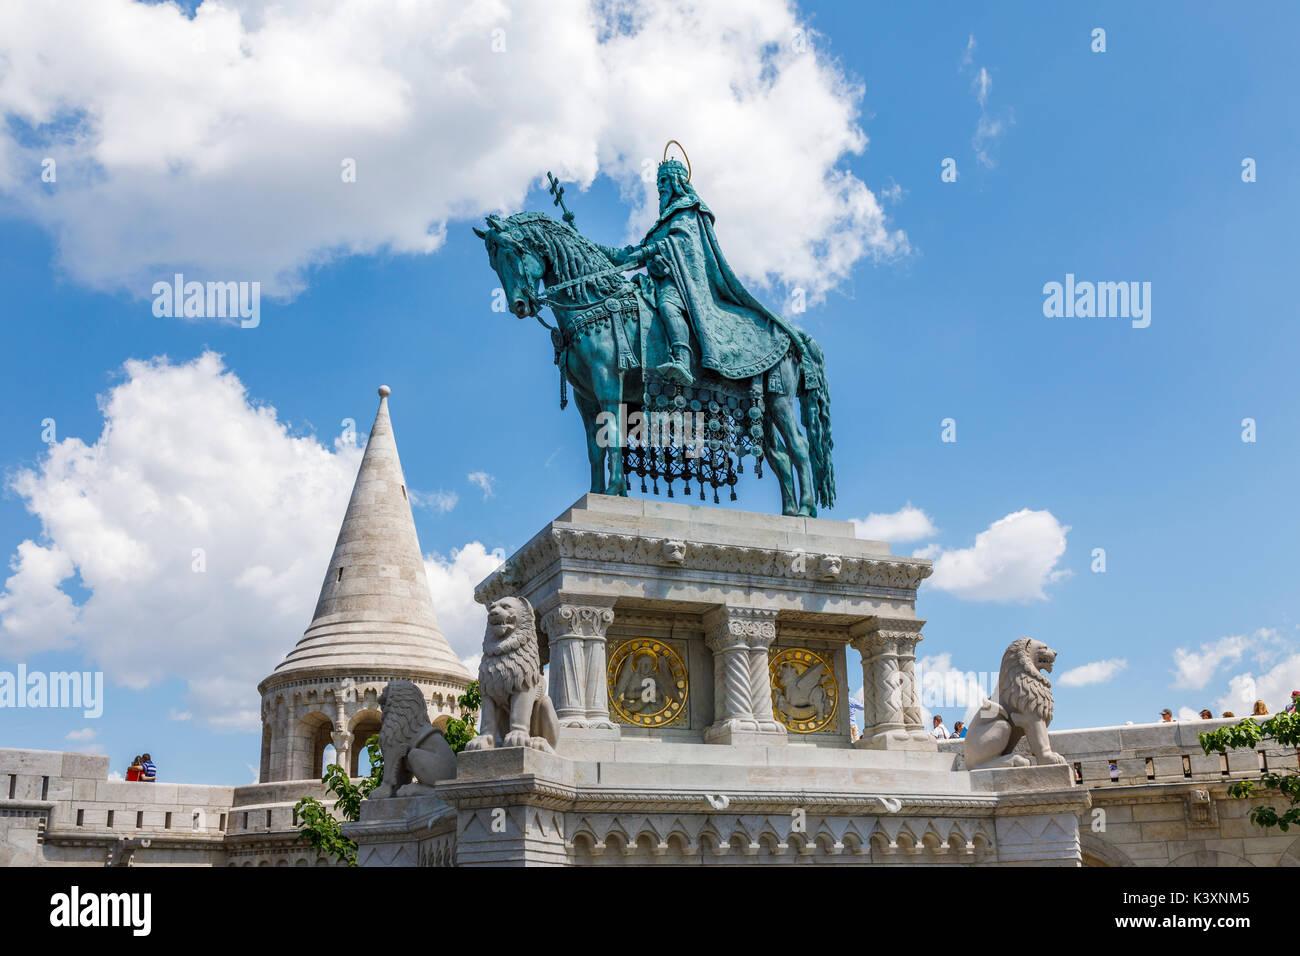 Statue of king St Stephen I of Hungary mounted on horseback, Fisherman's Bastion, Castle Hill, Buda, Budapest, capital city of Hungary, central Europe - Stock Image